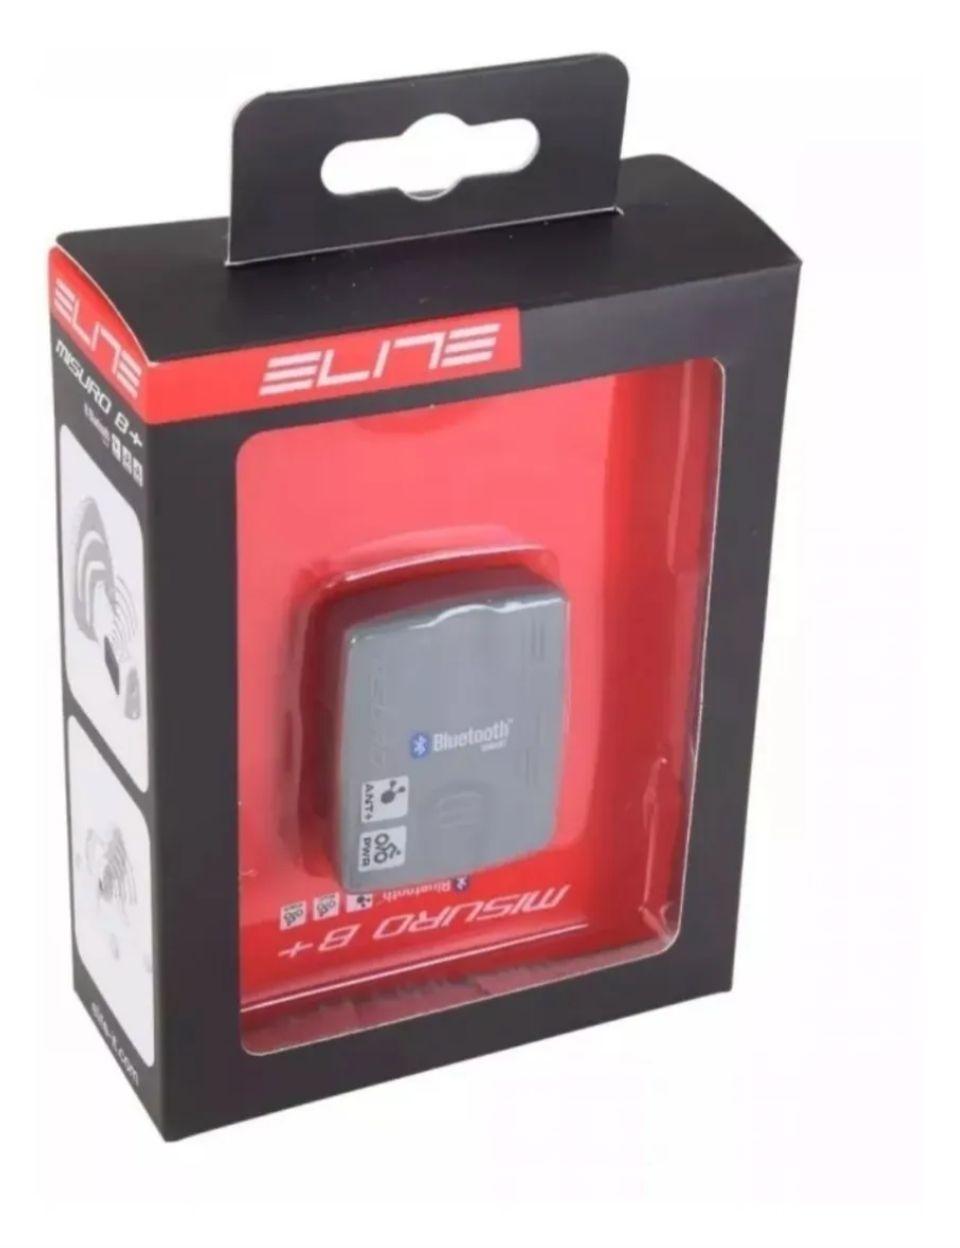 Sensor De Velocidade Potencia Cadencia Elite Misuro B+